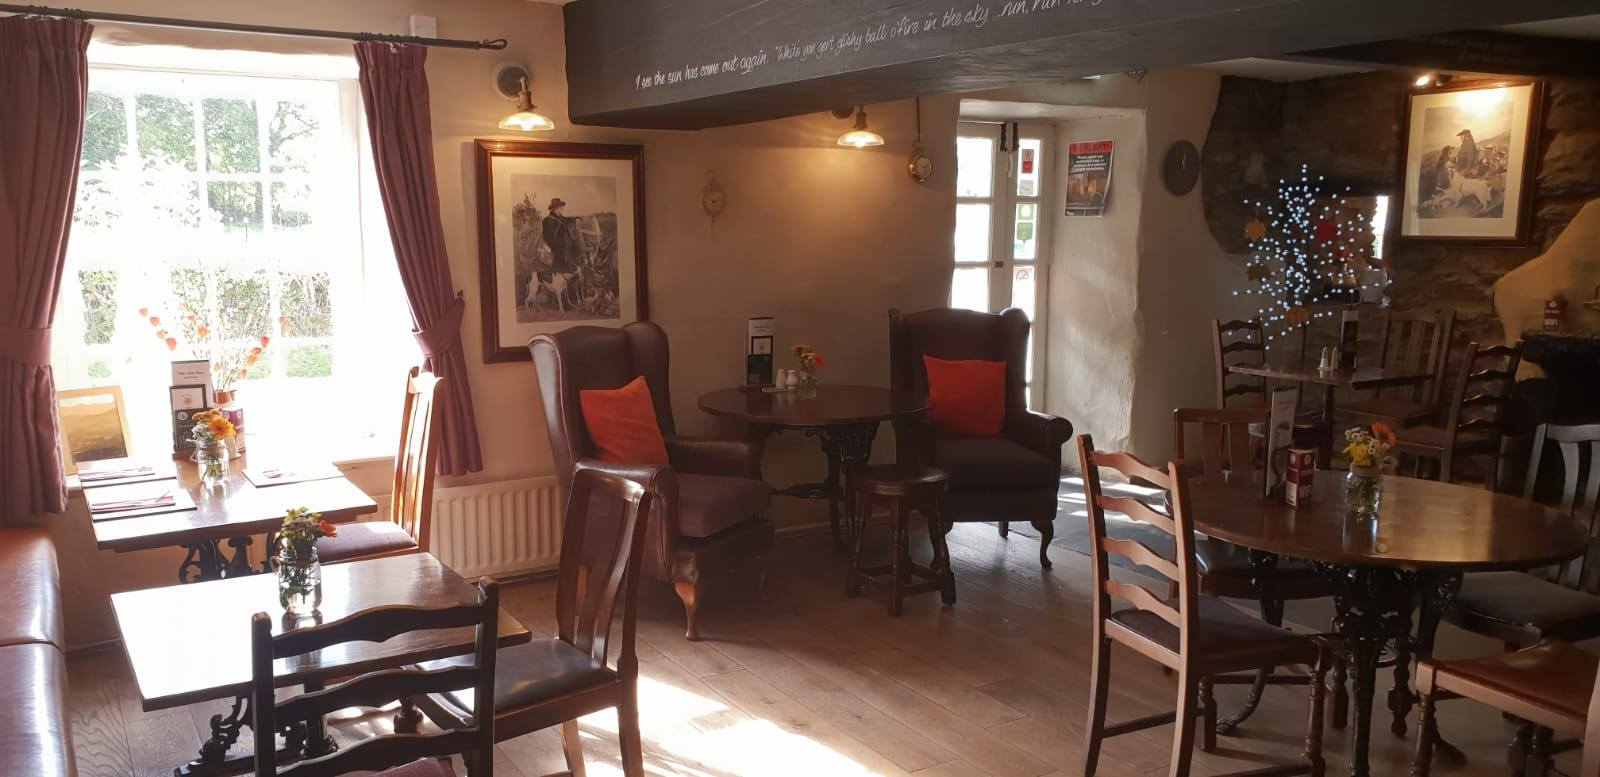 Sun Inn Pub Kendal Windermere (20)